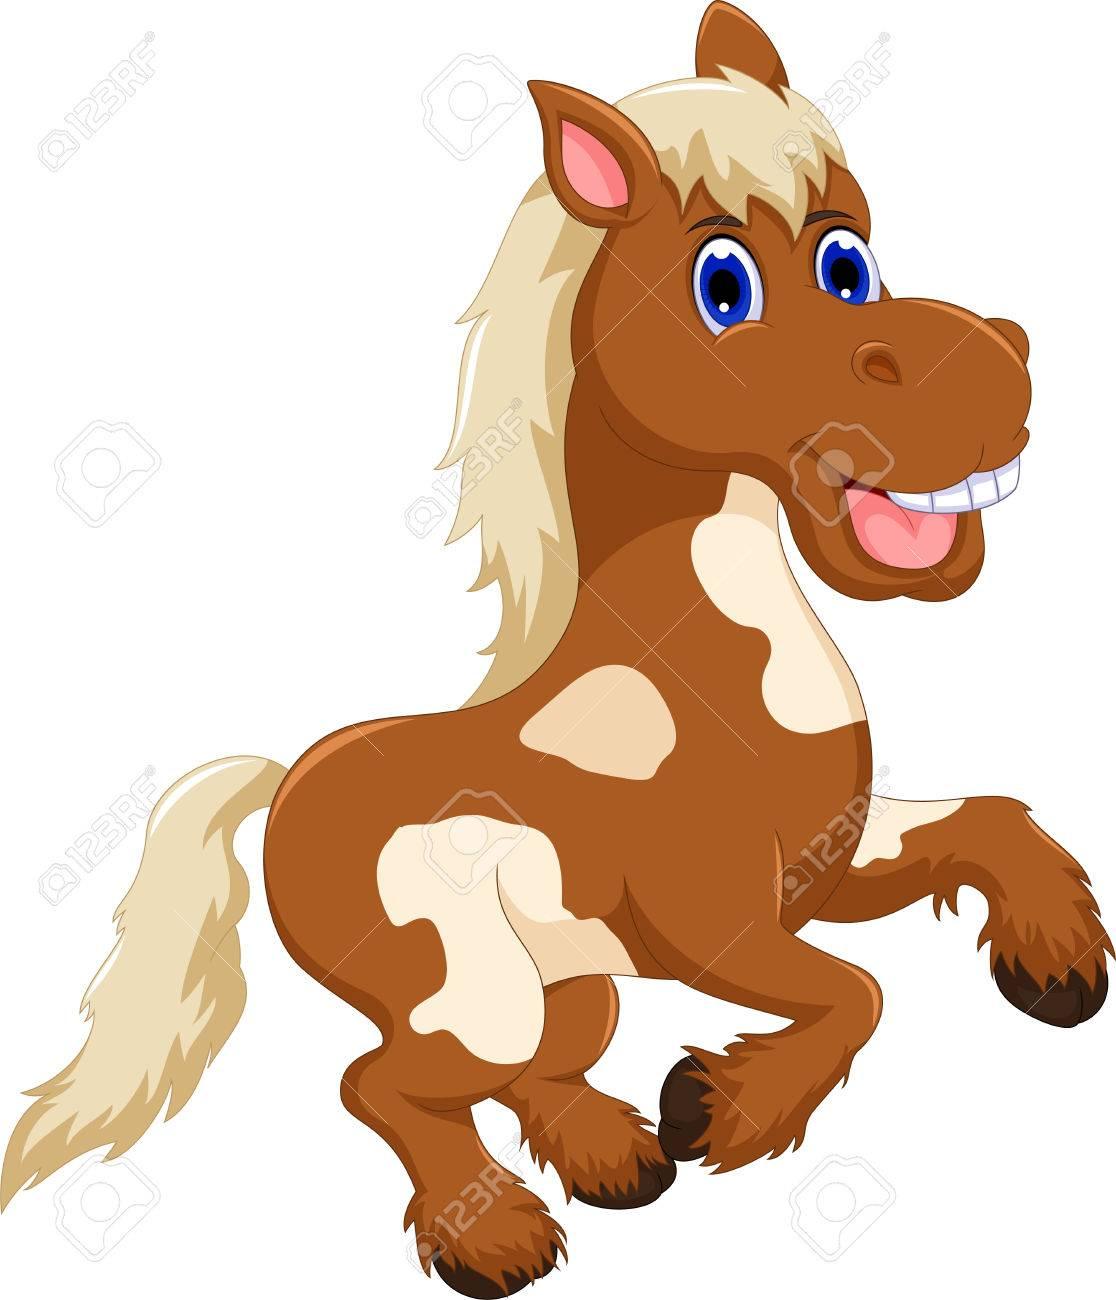 Funny Horse Cartoon Jumping Royalty Free Cliparts Vectors And Stock Illustration Image 73166030